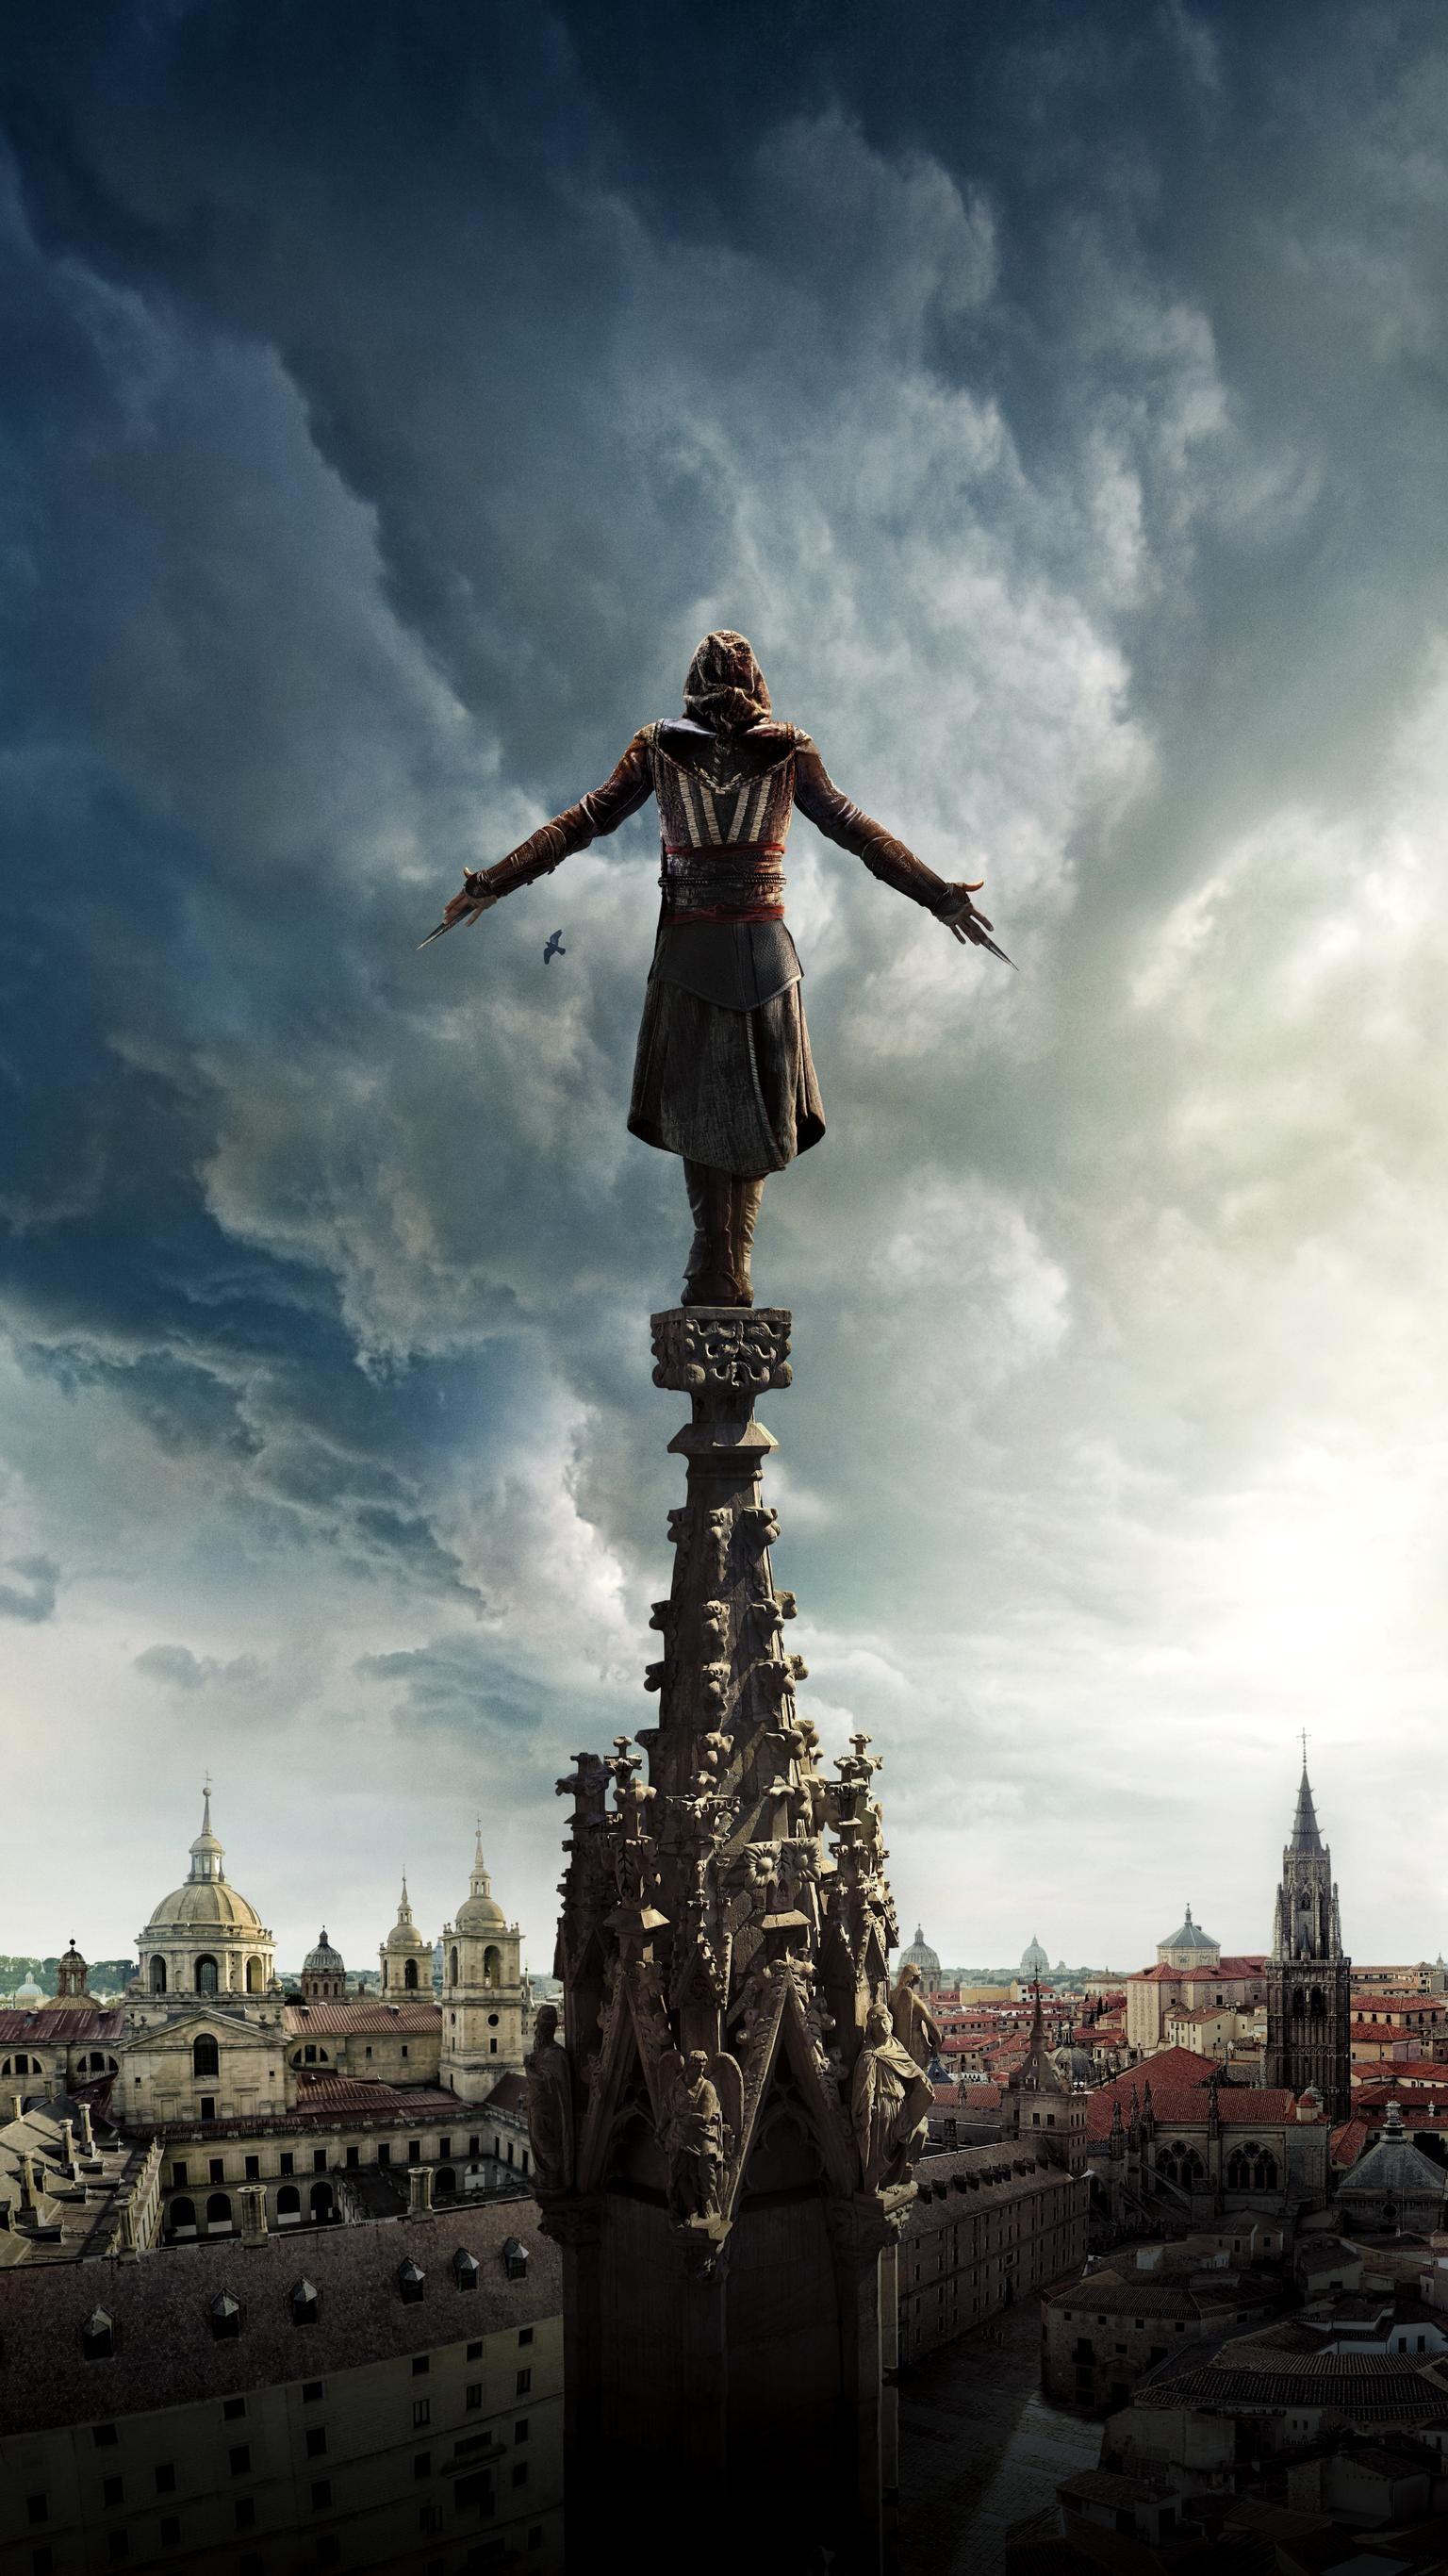 Assassin's Creed (2016) Phone Wallpaper Фоновые изображения